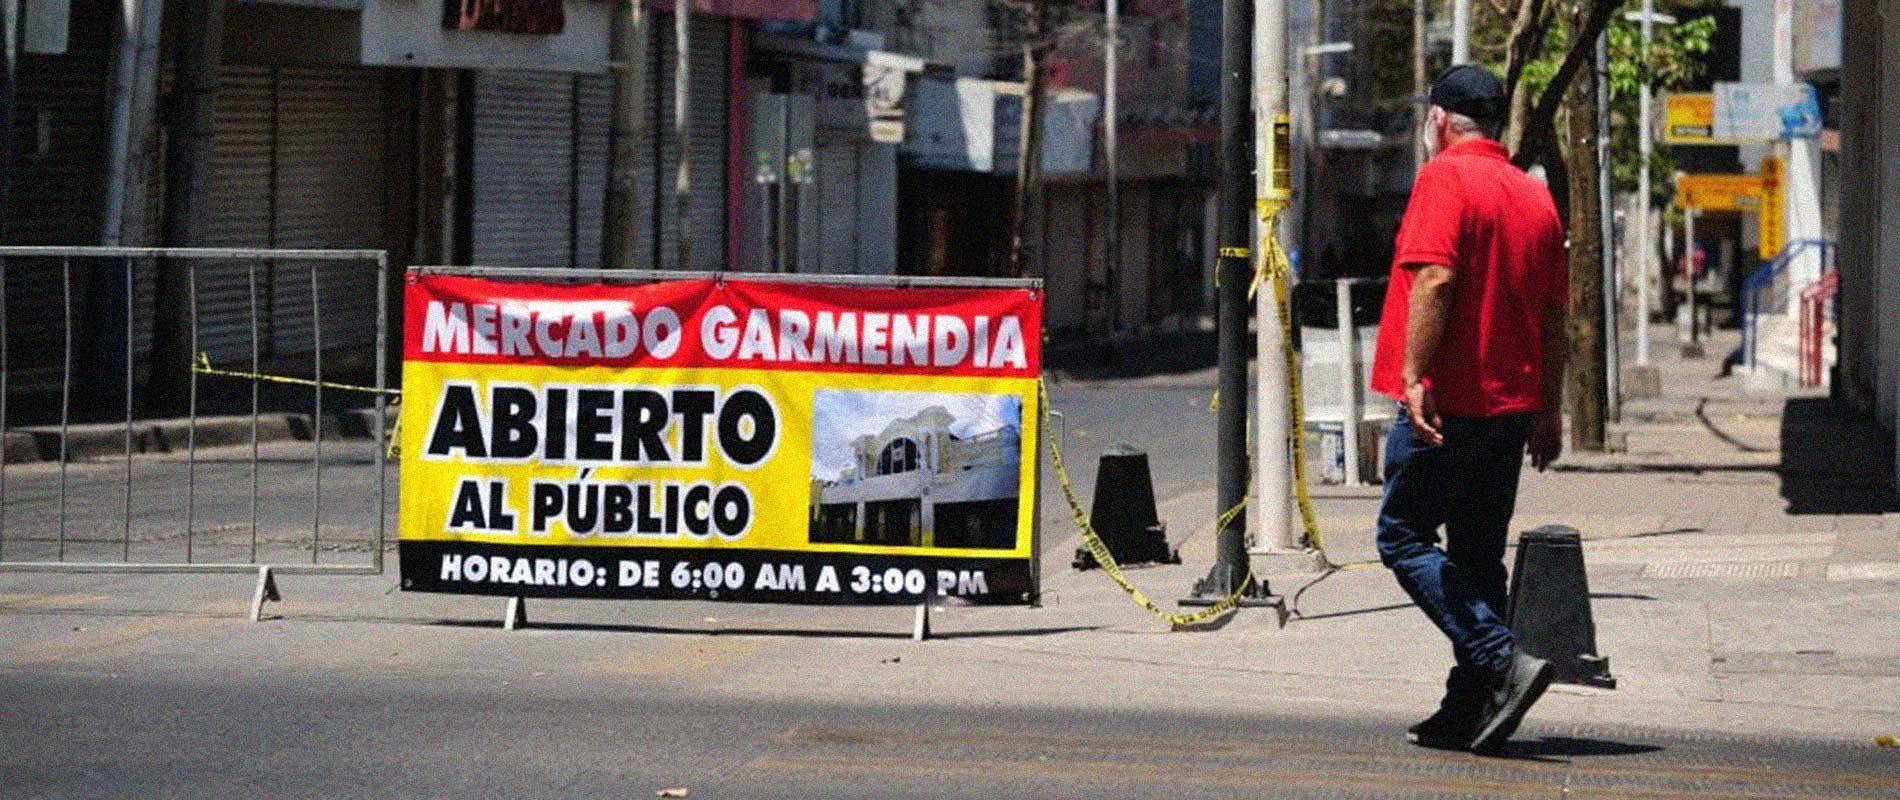 FOTO: Rolando Carvajal/Revista ESPEJO.